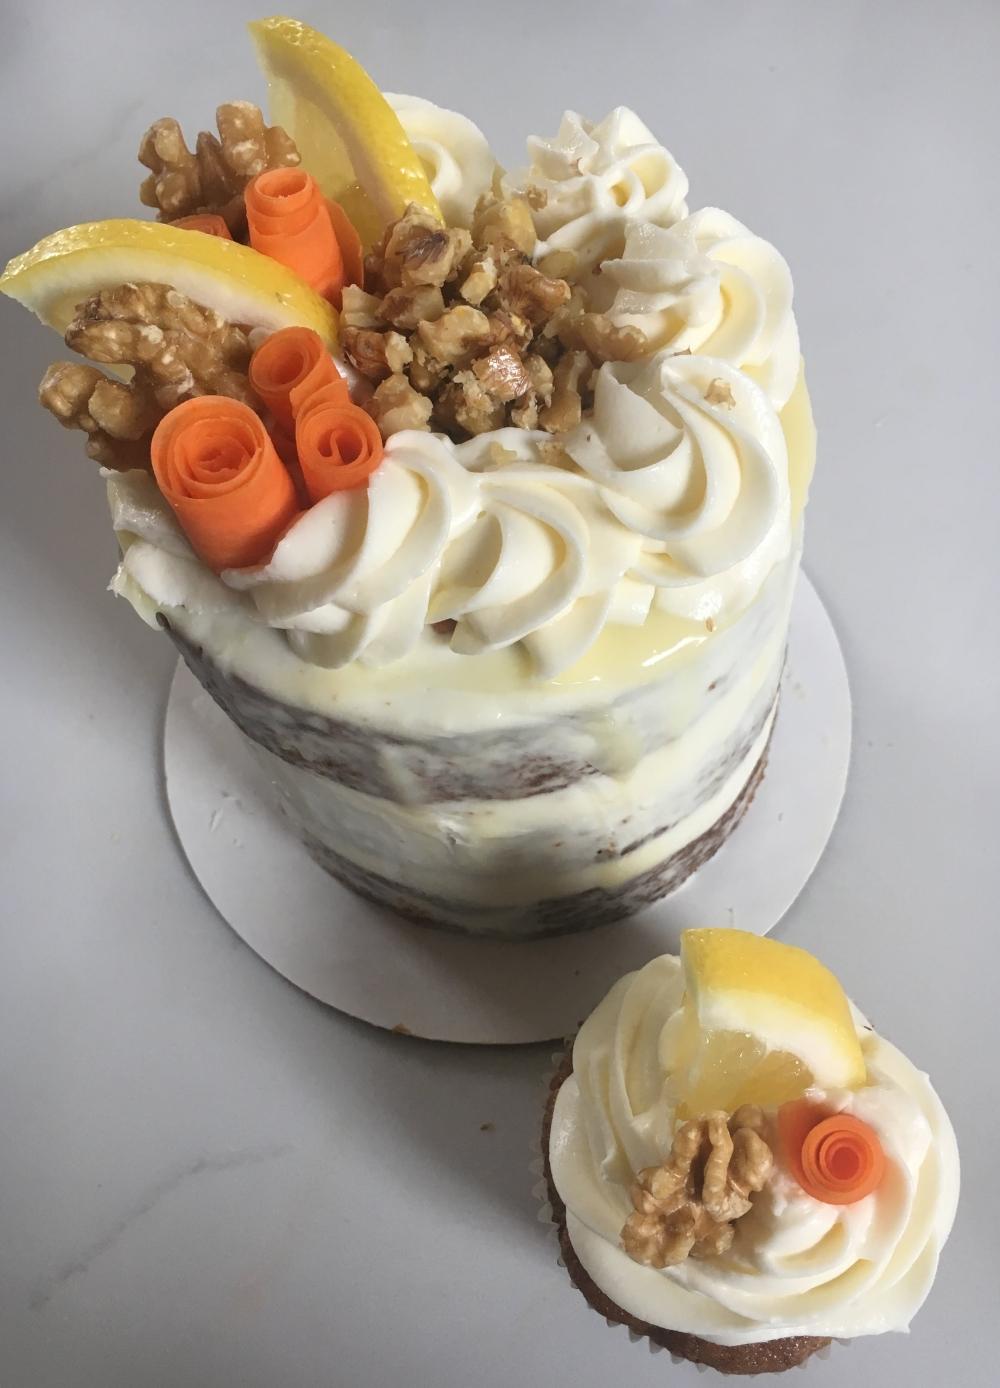 carrot-cake-and-cupcake.jpg